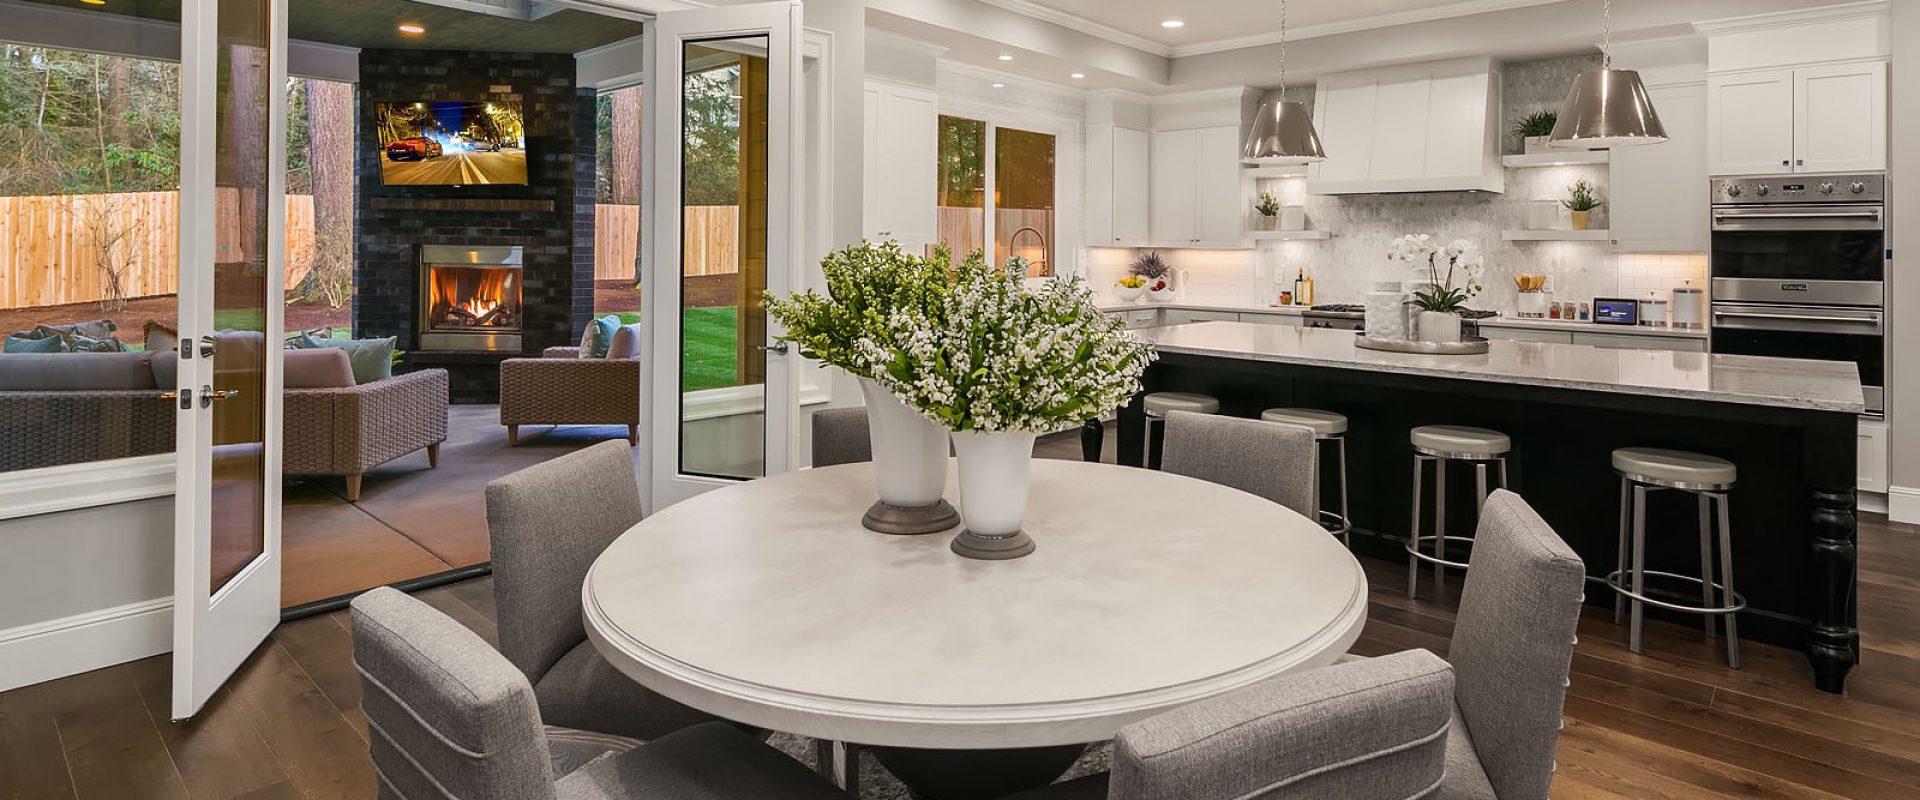 142-15056 NE 11th Pl-bellevue-wa-mn-custom-homes-kitchen-table